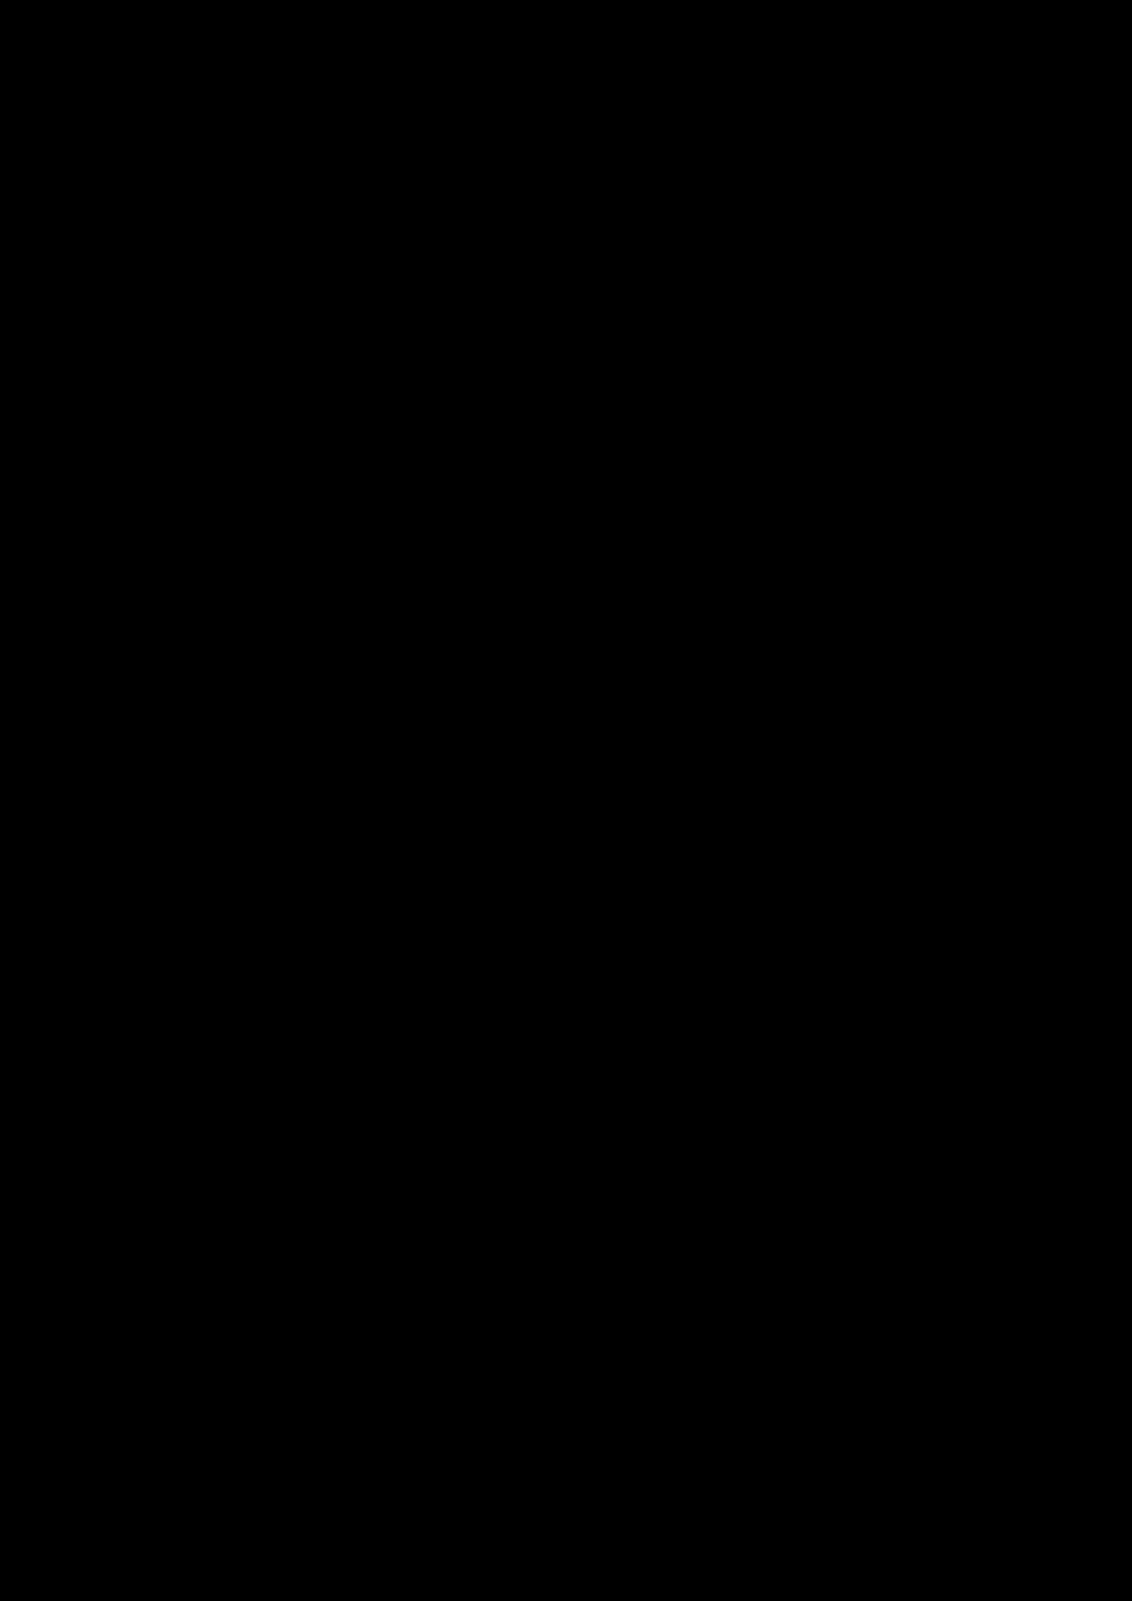 Okean Pustotyi slide, Image 20